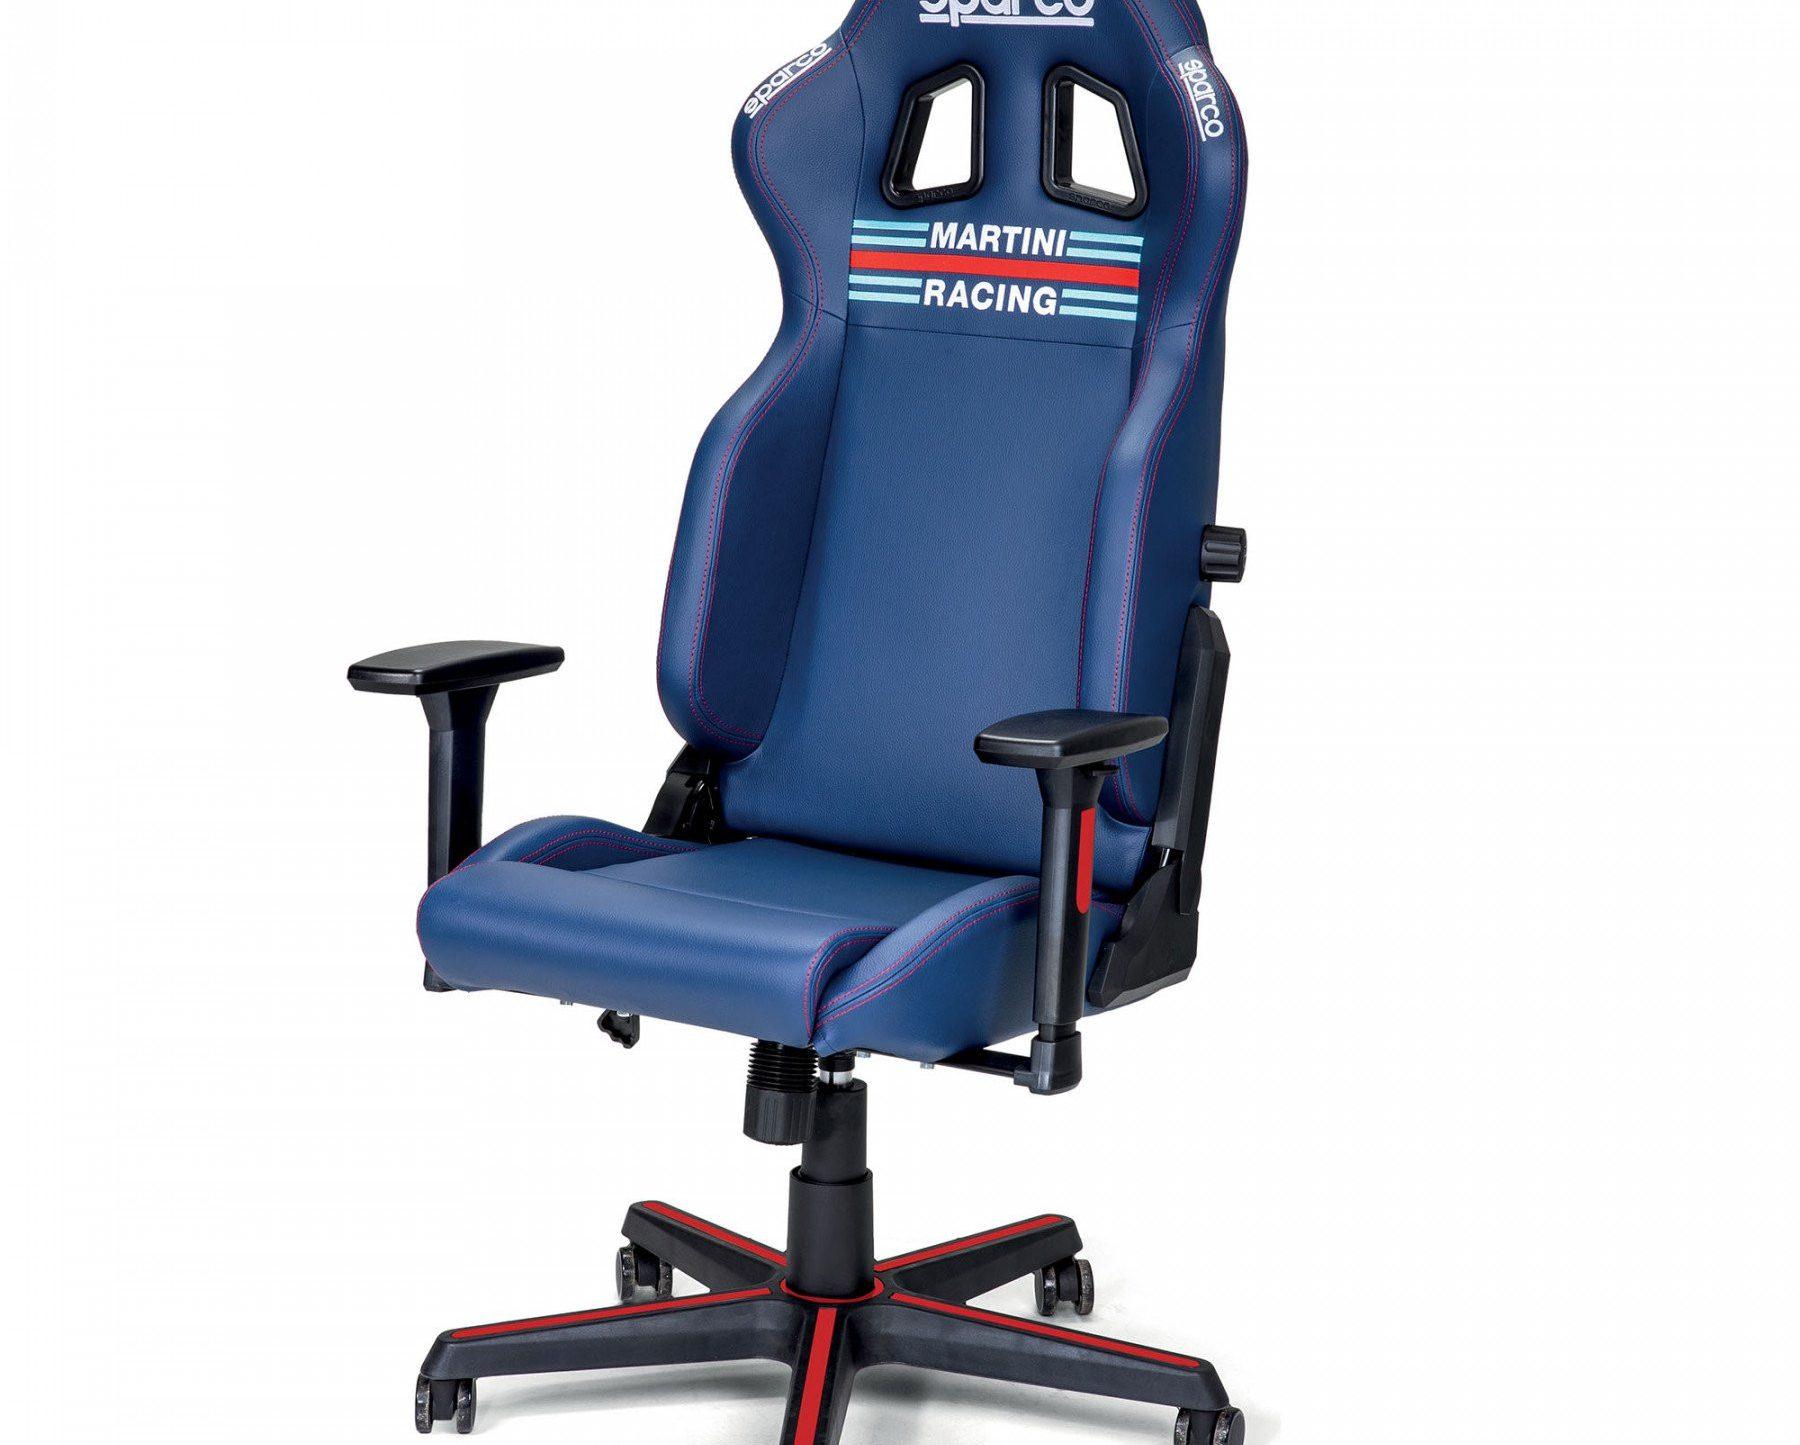 Нов продукт: Sparco Martini Racing Icon, Office Chair